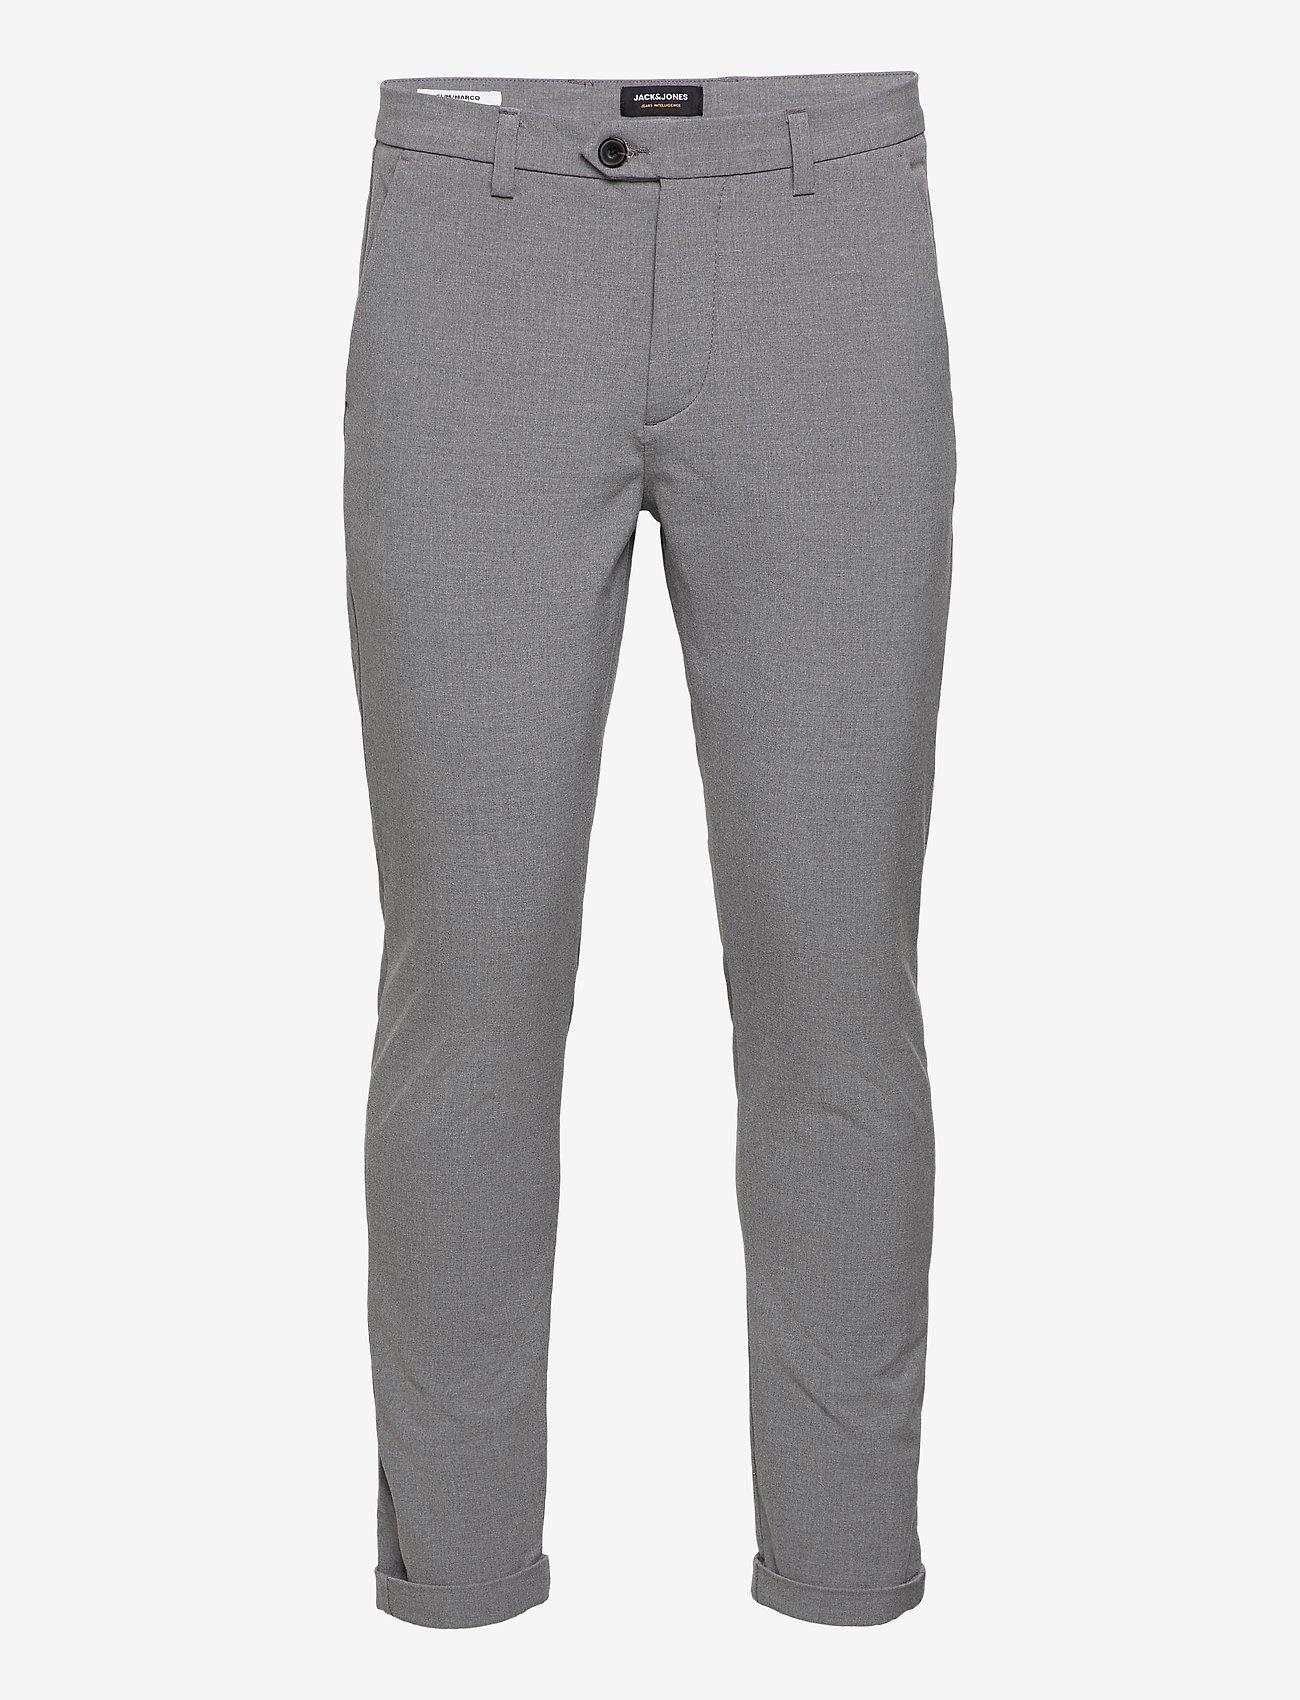 Jack & Jones - JJIMARCO JJCONNOR AKM 909 GREY MEL NOOS - pantalons habillés - grey melange - 0